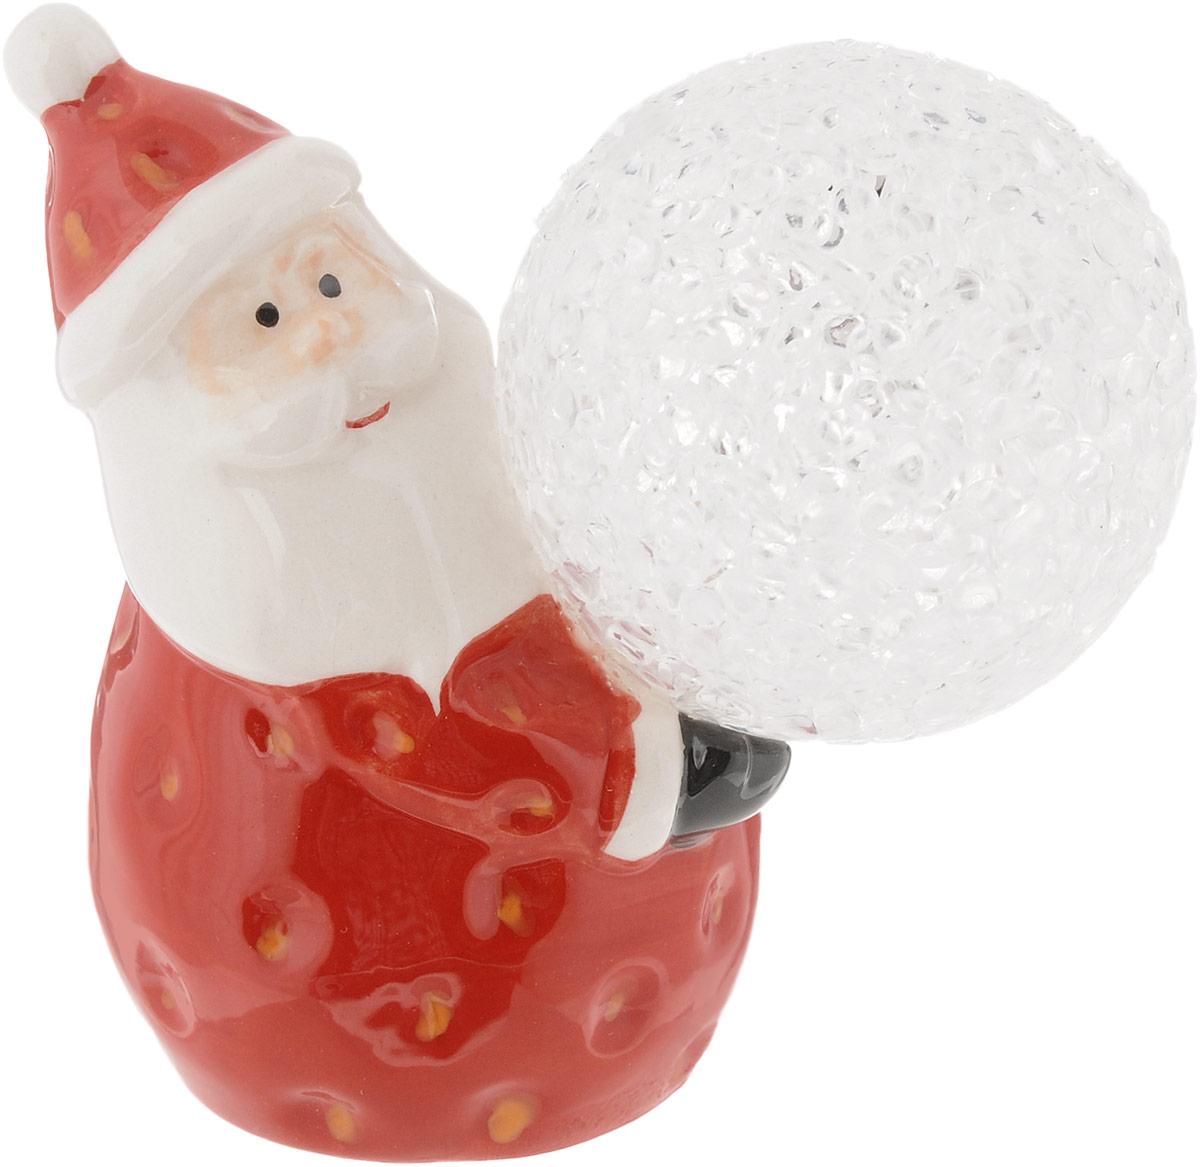 Фигурка декоративная House & Holder Дед Мороз, с подсветкой, высота 9 см 5pcs battery holder bs 5 cr2032 holder